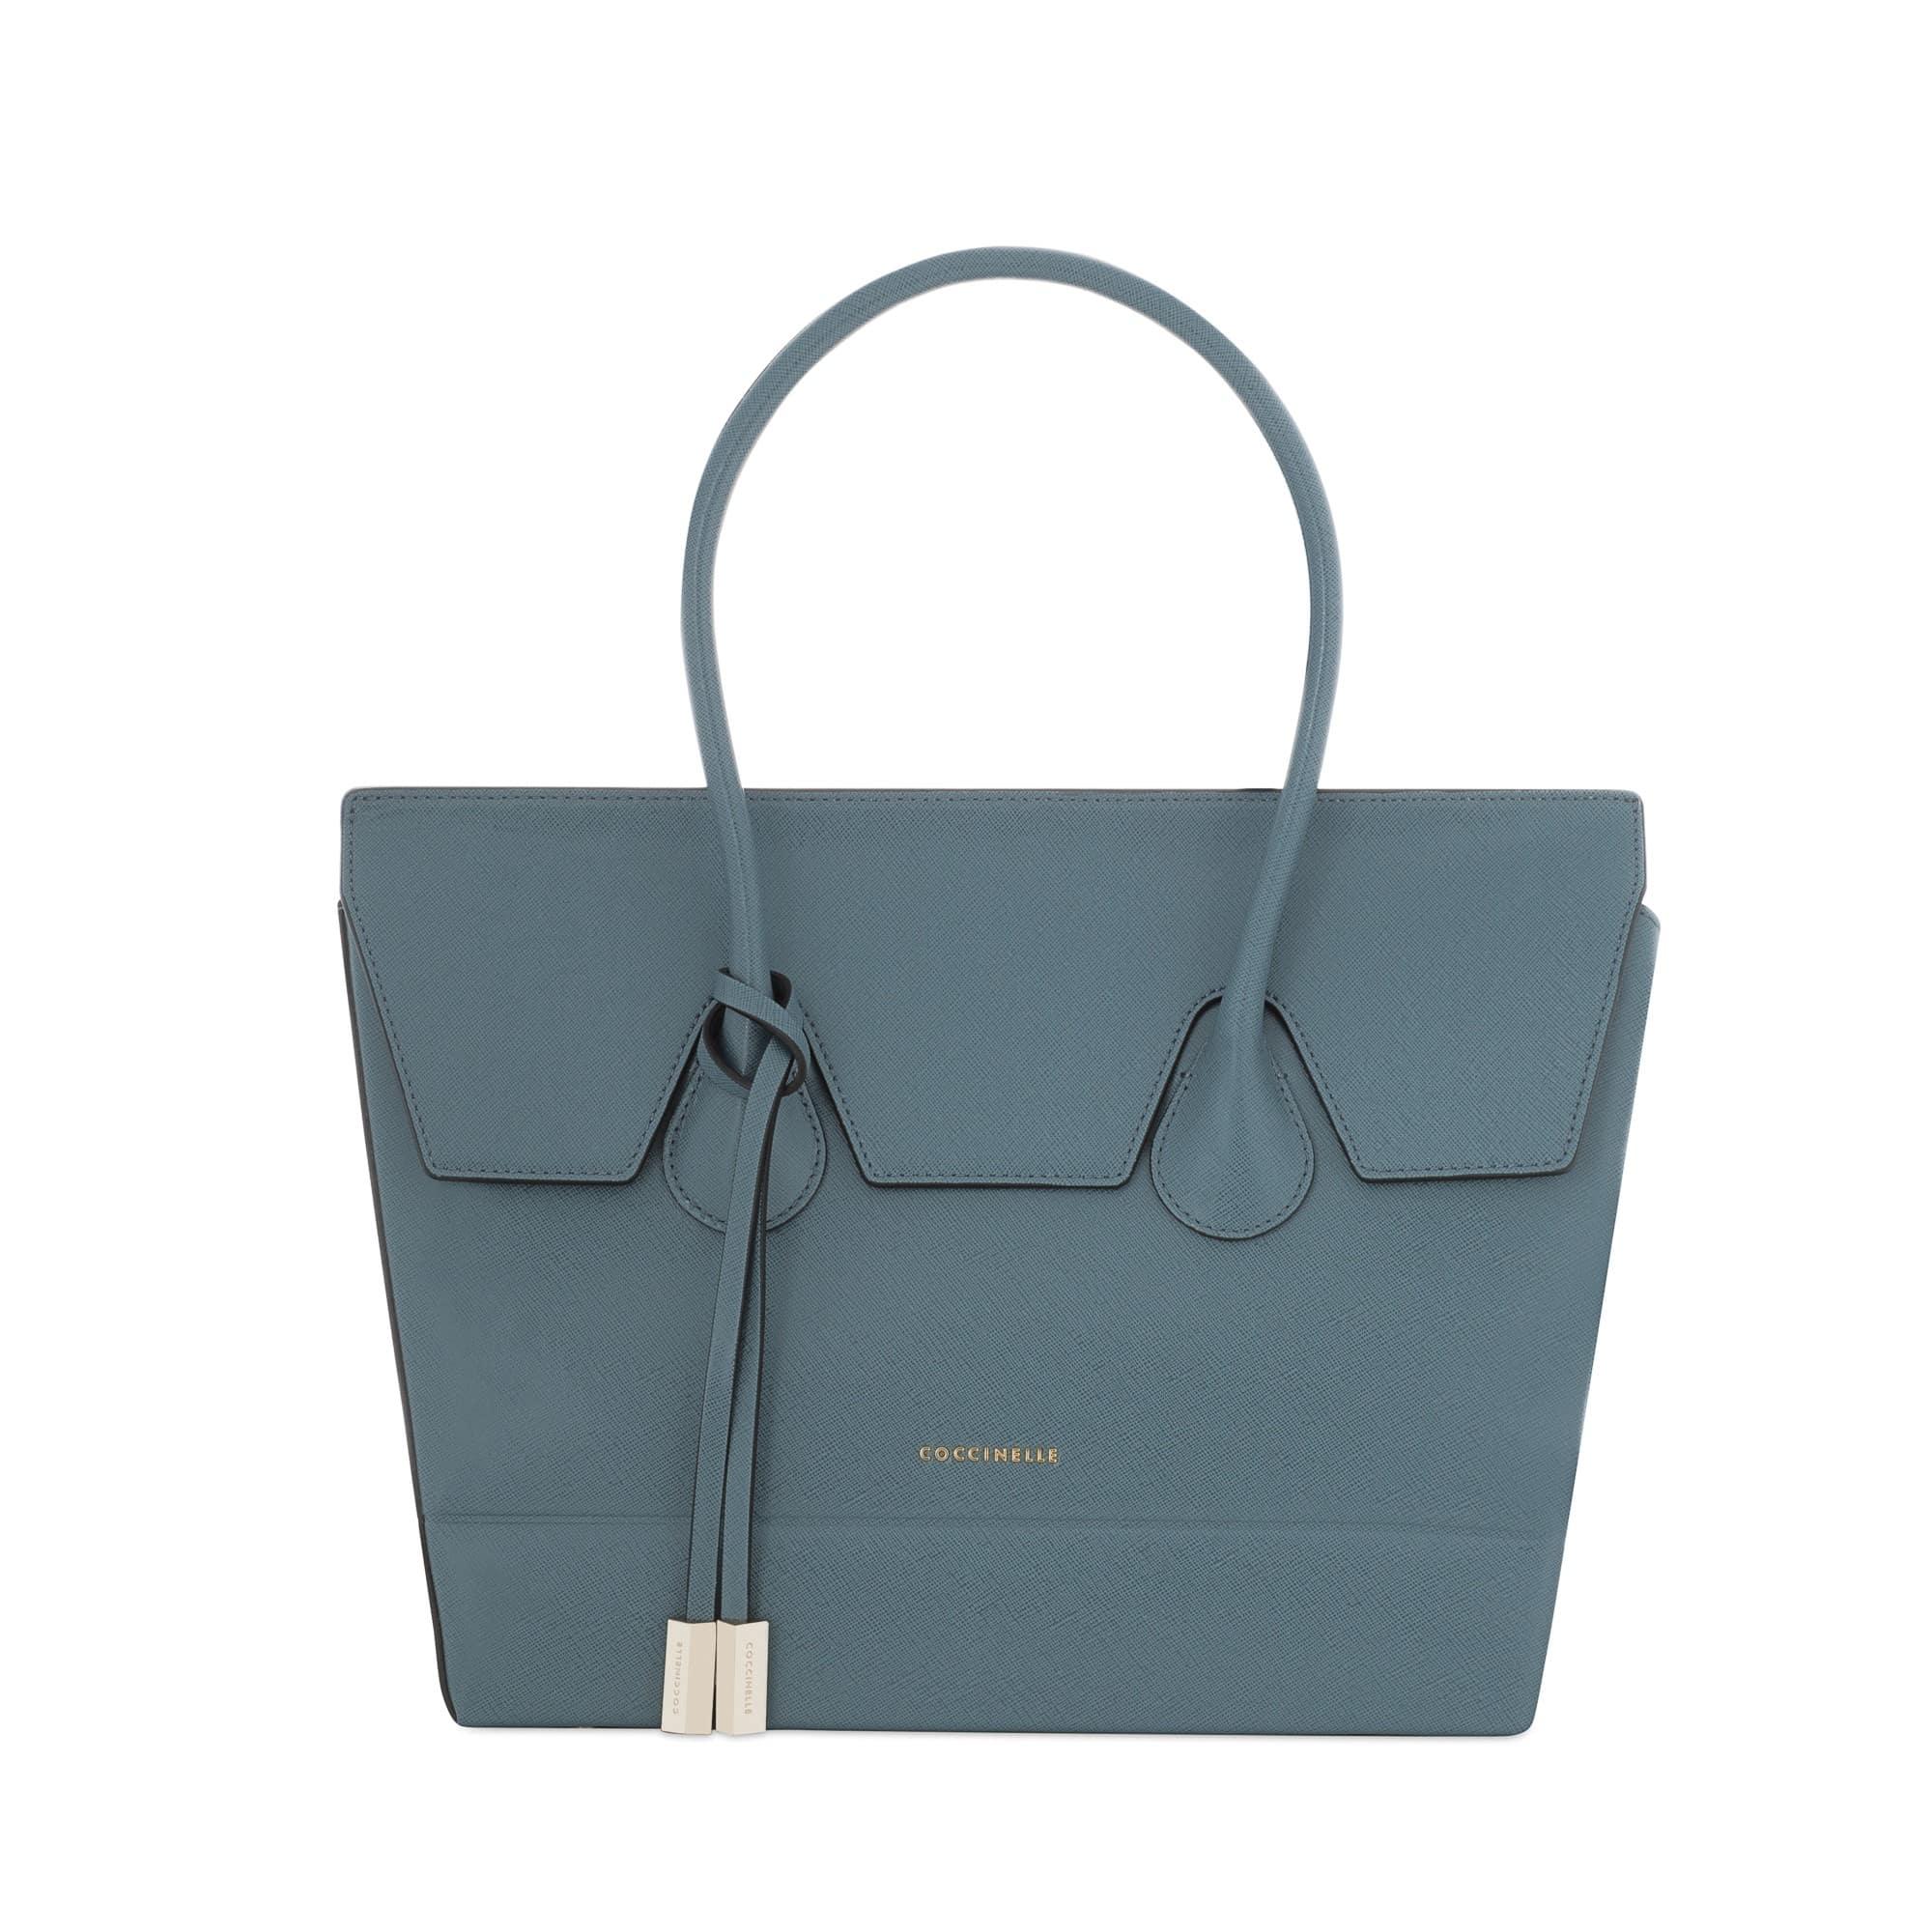 Coccinelle shopping bag saffiano topazio 290.00 euro